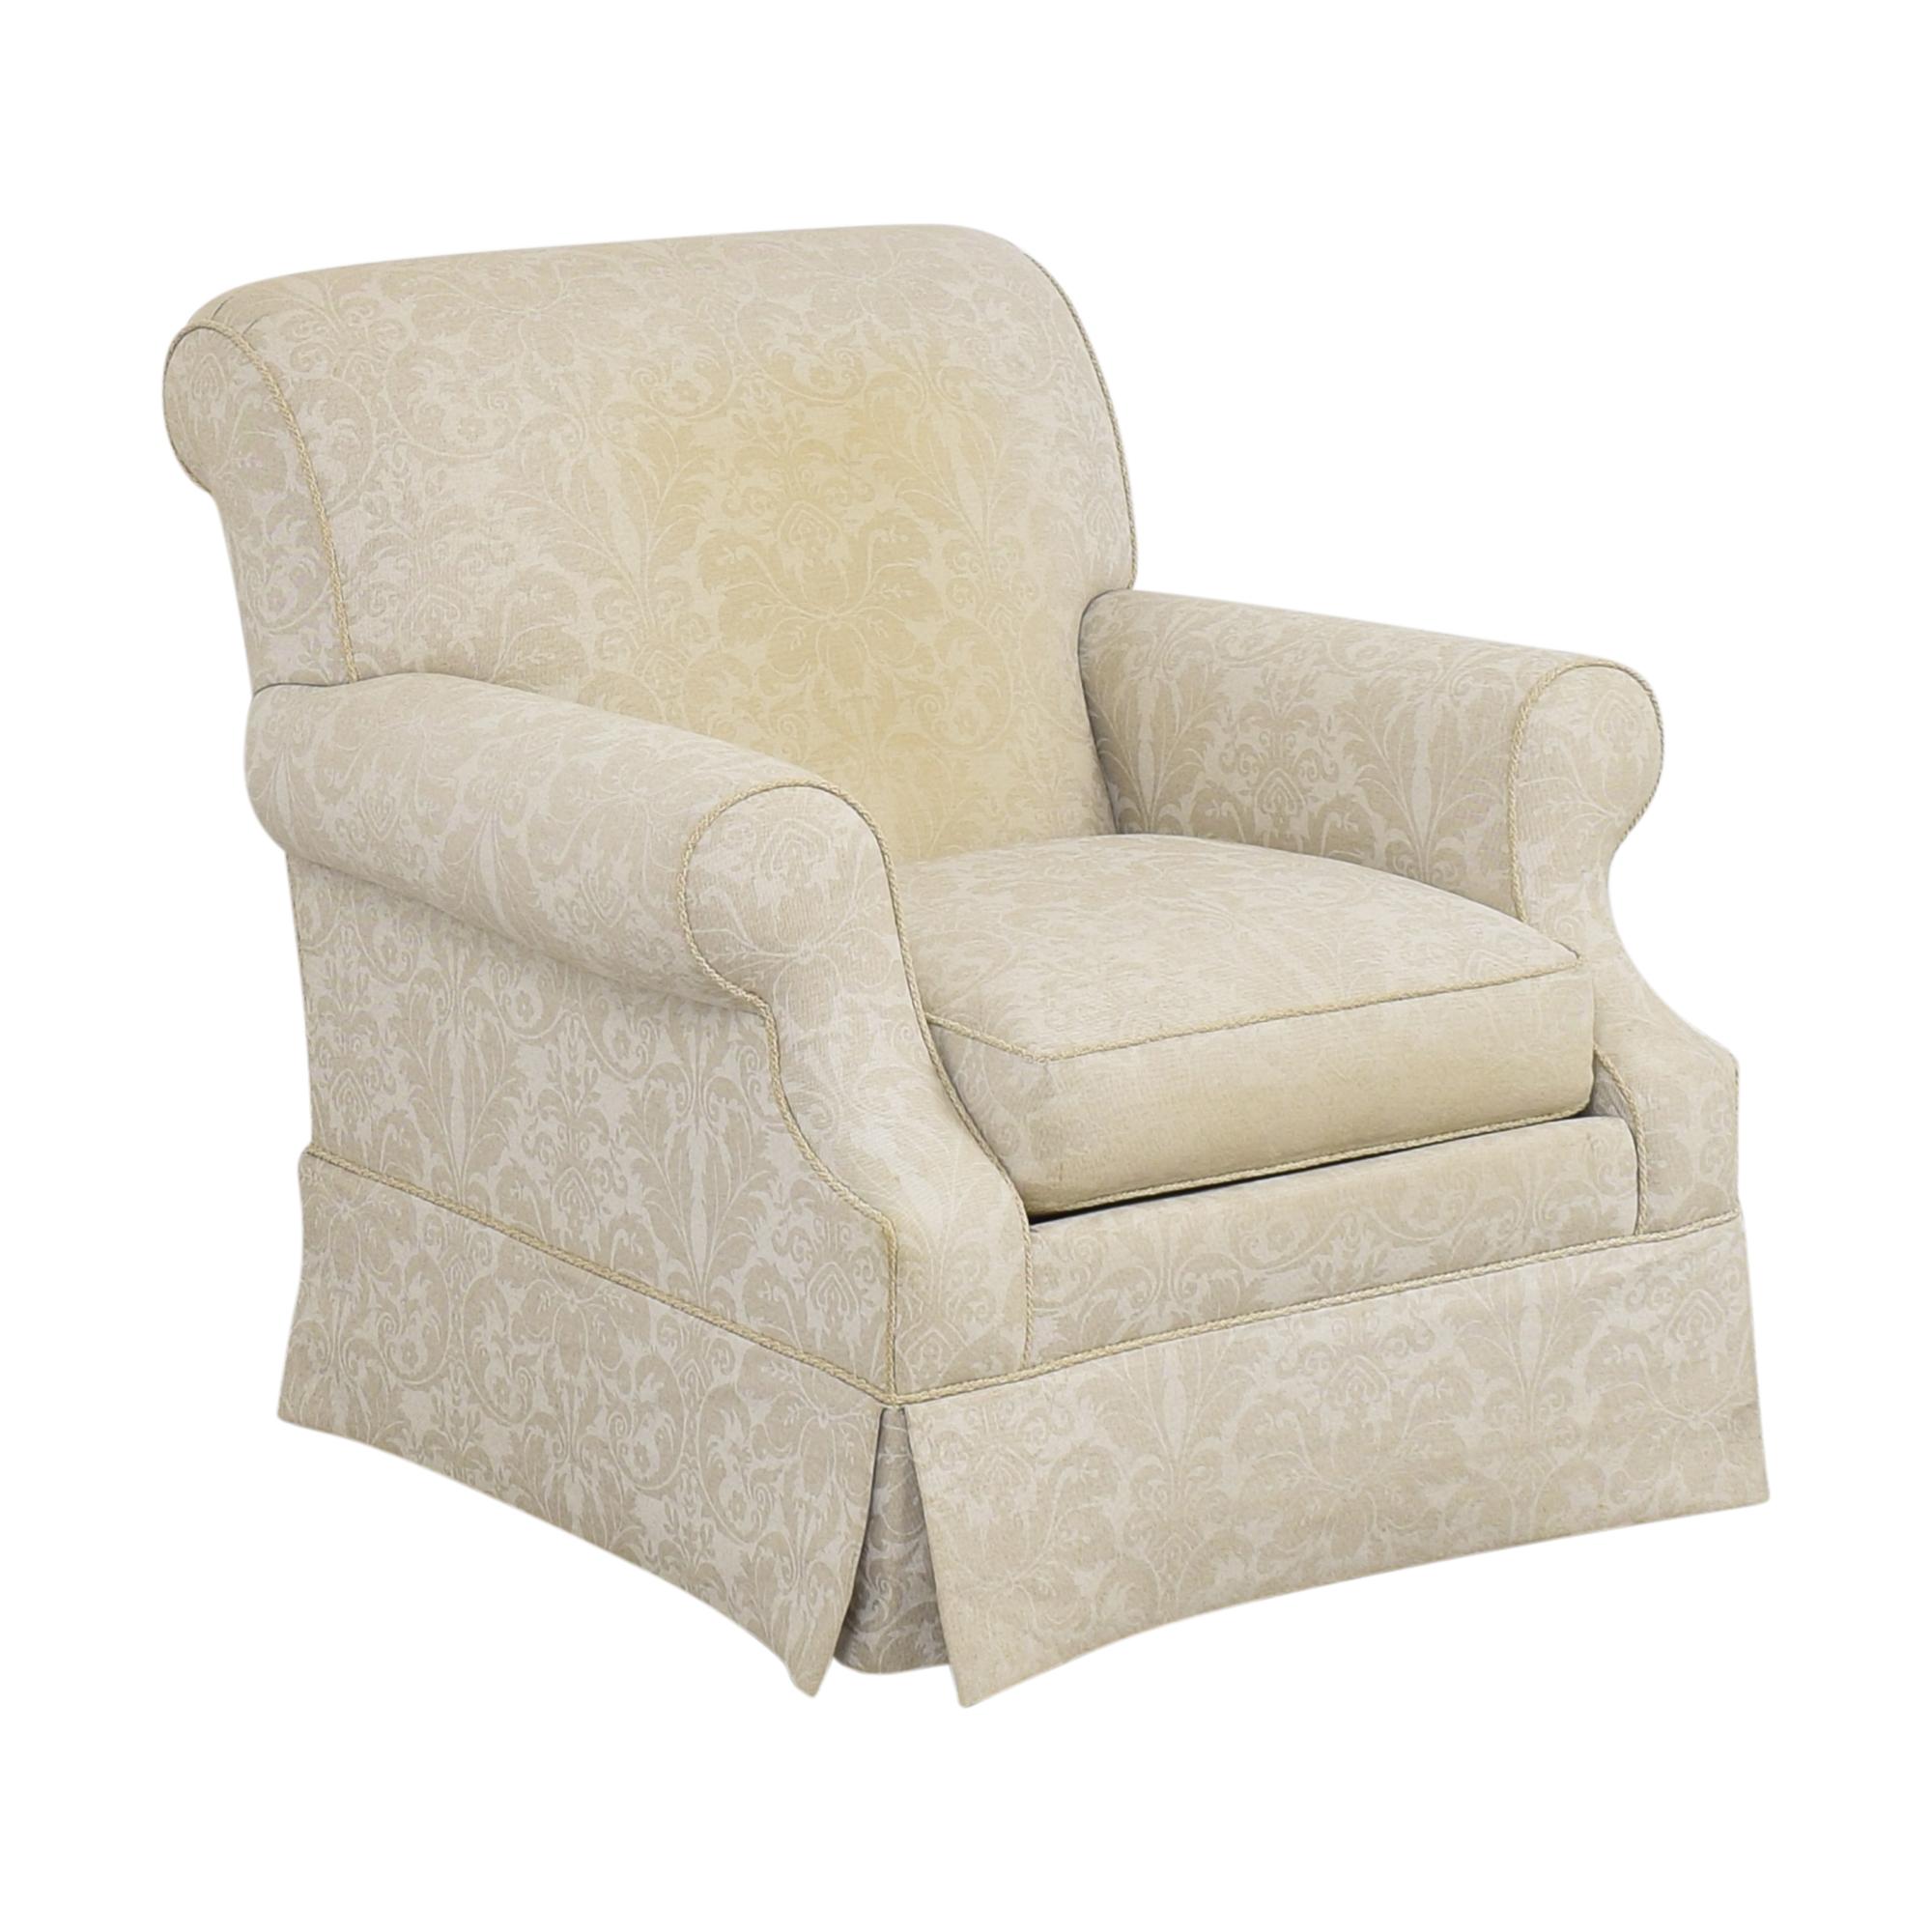 Ethan Allen Damask Accent Chair sale